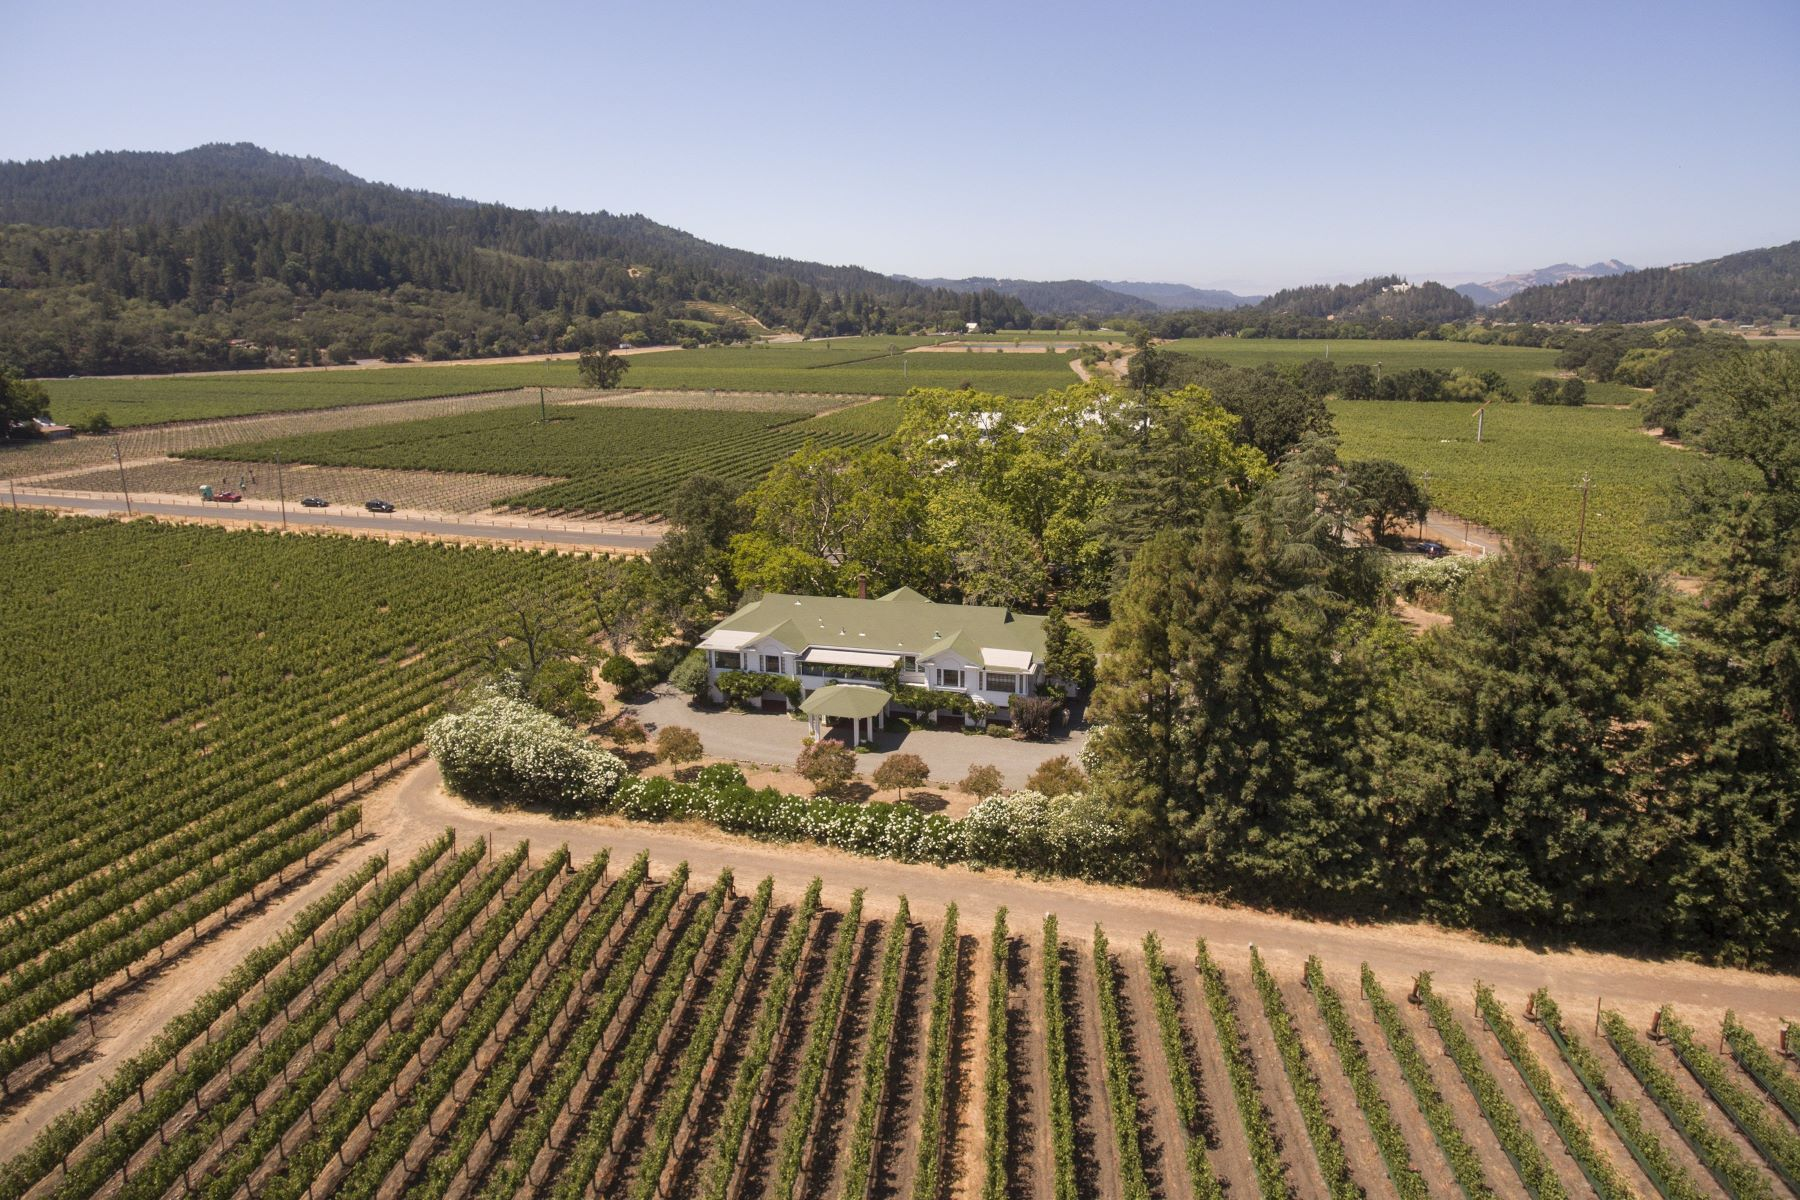 Casa Unifamiliar por un Venta en Larkmead Inn in the Vineyards 1103 Larkmead Lane Calistoga, California 94515 Estados Unidos